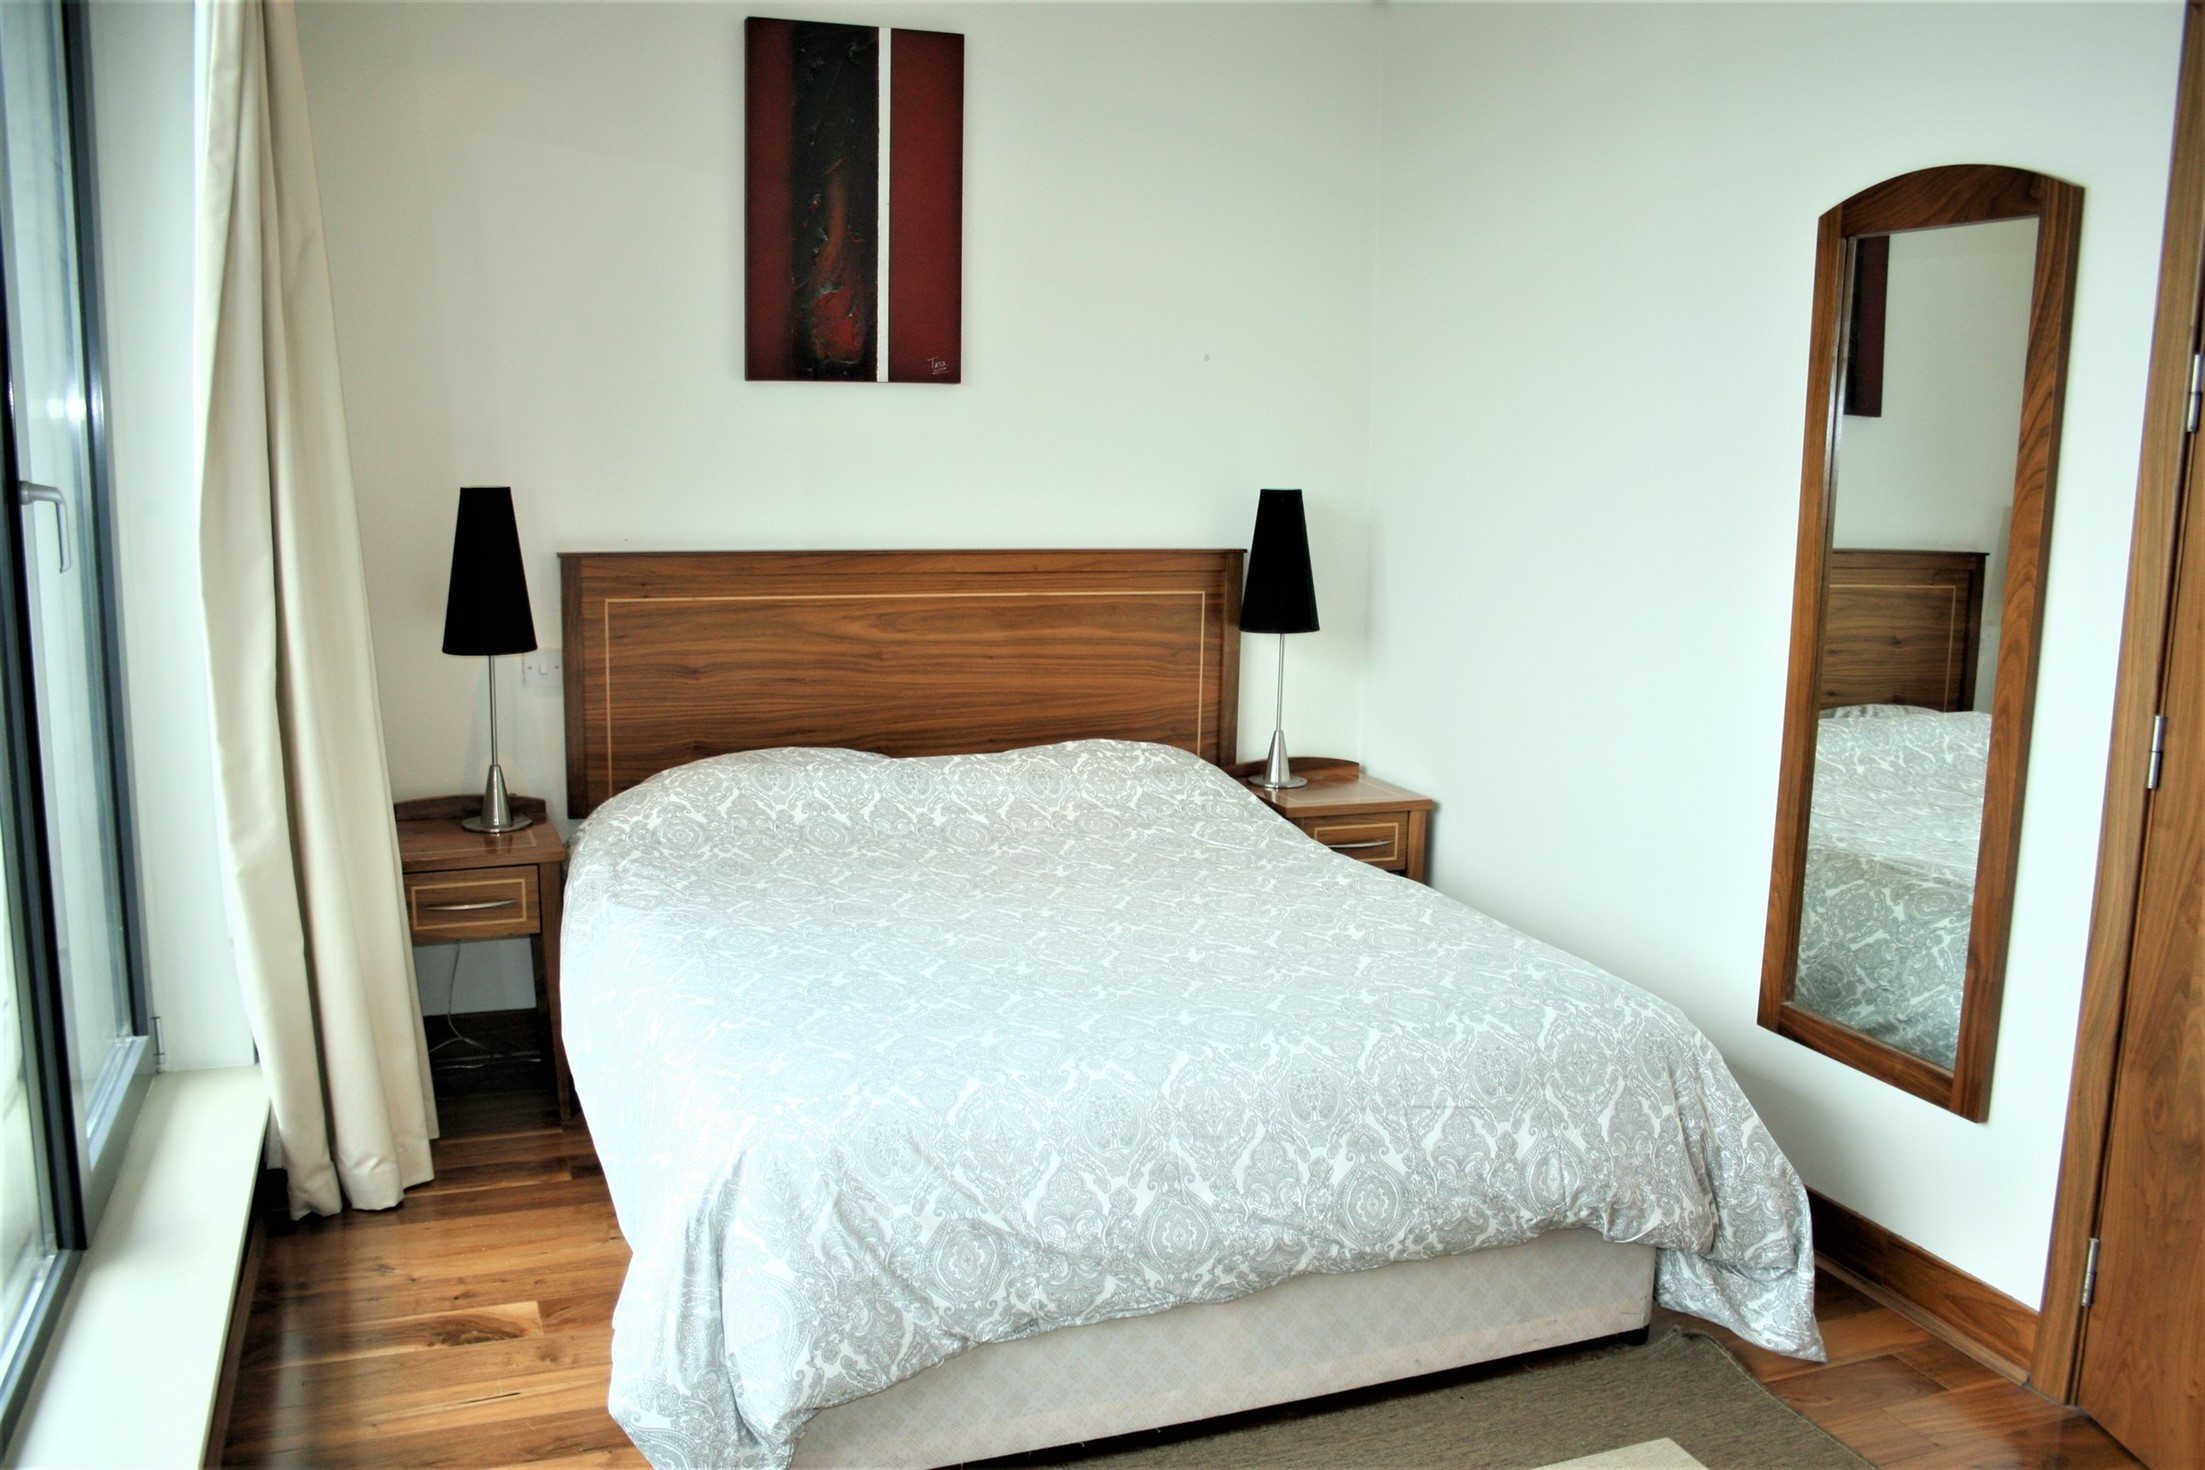 Apartment 502, Shelbourne Plaza, South Dock Road, Dublin 4